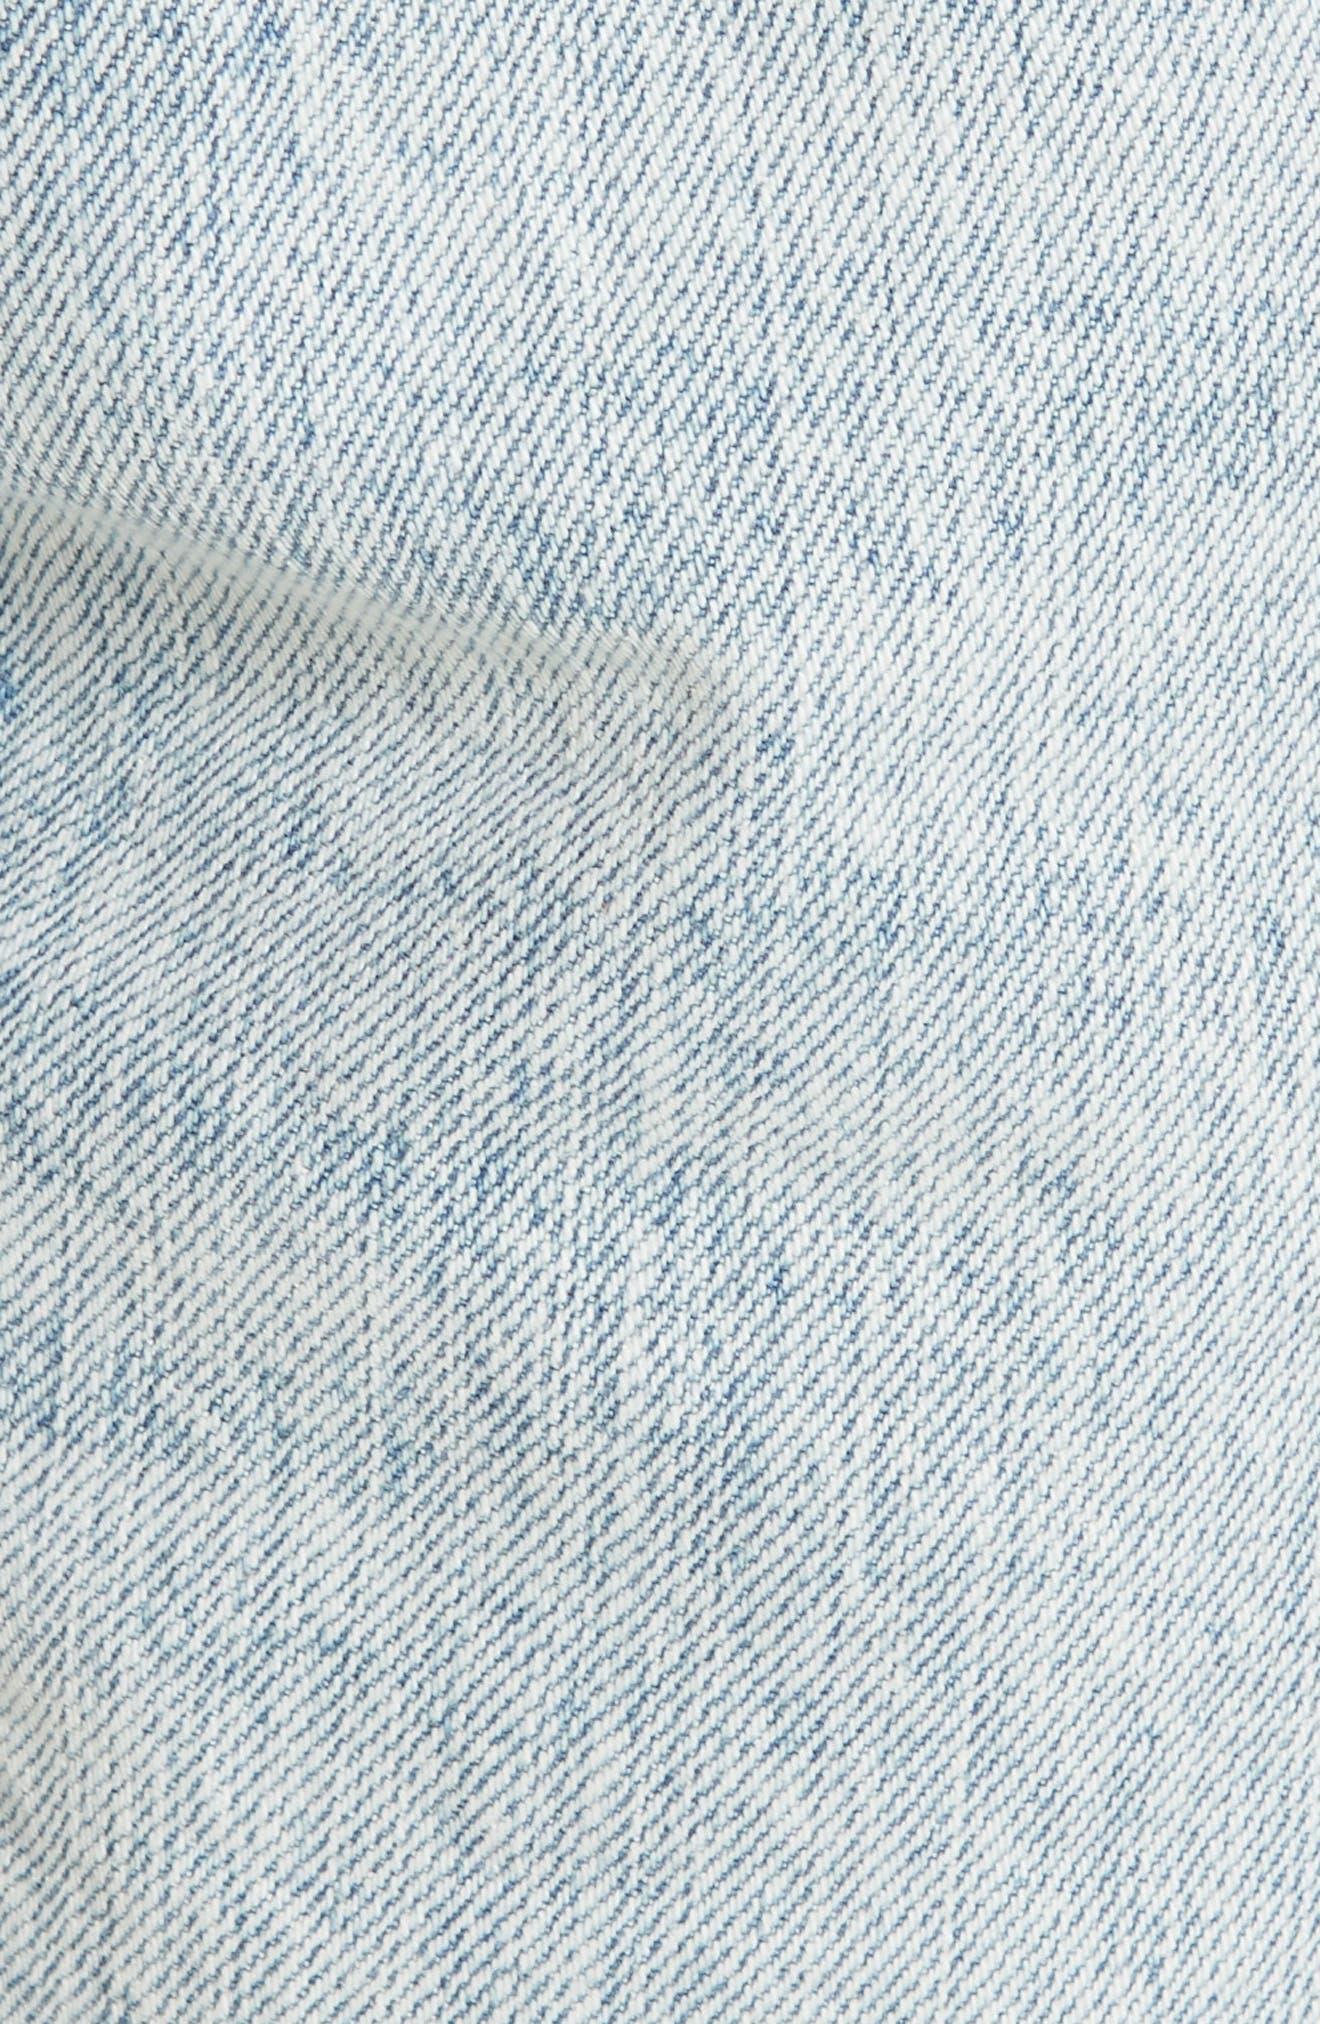 RAG & BONE, JEAN Cutoff Boyfriend Shorts, Alternate thumbnail 6, color, 420